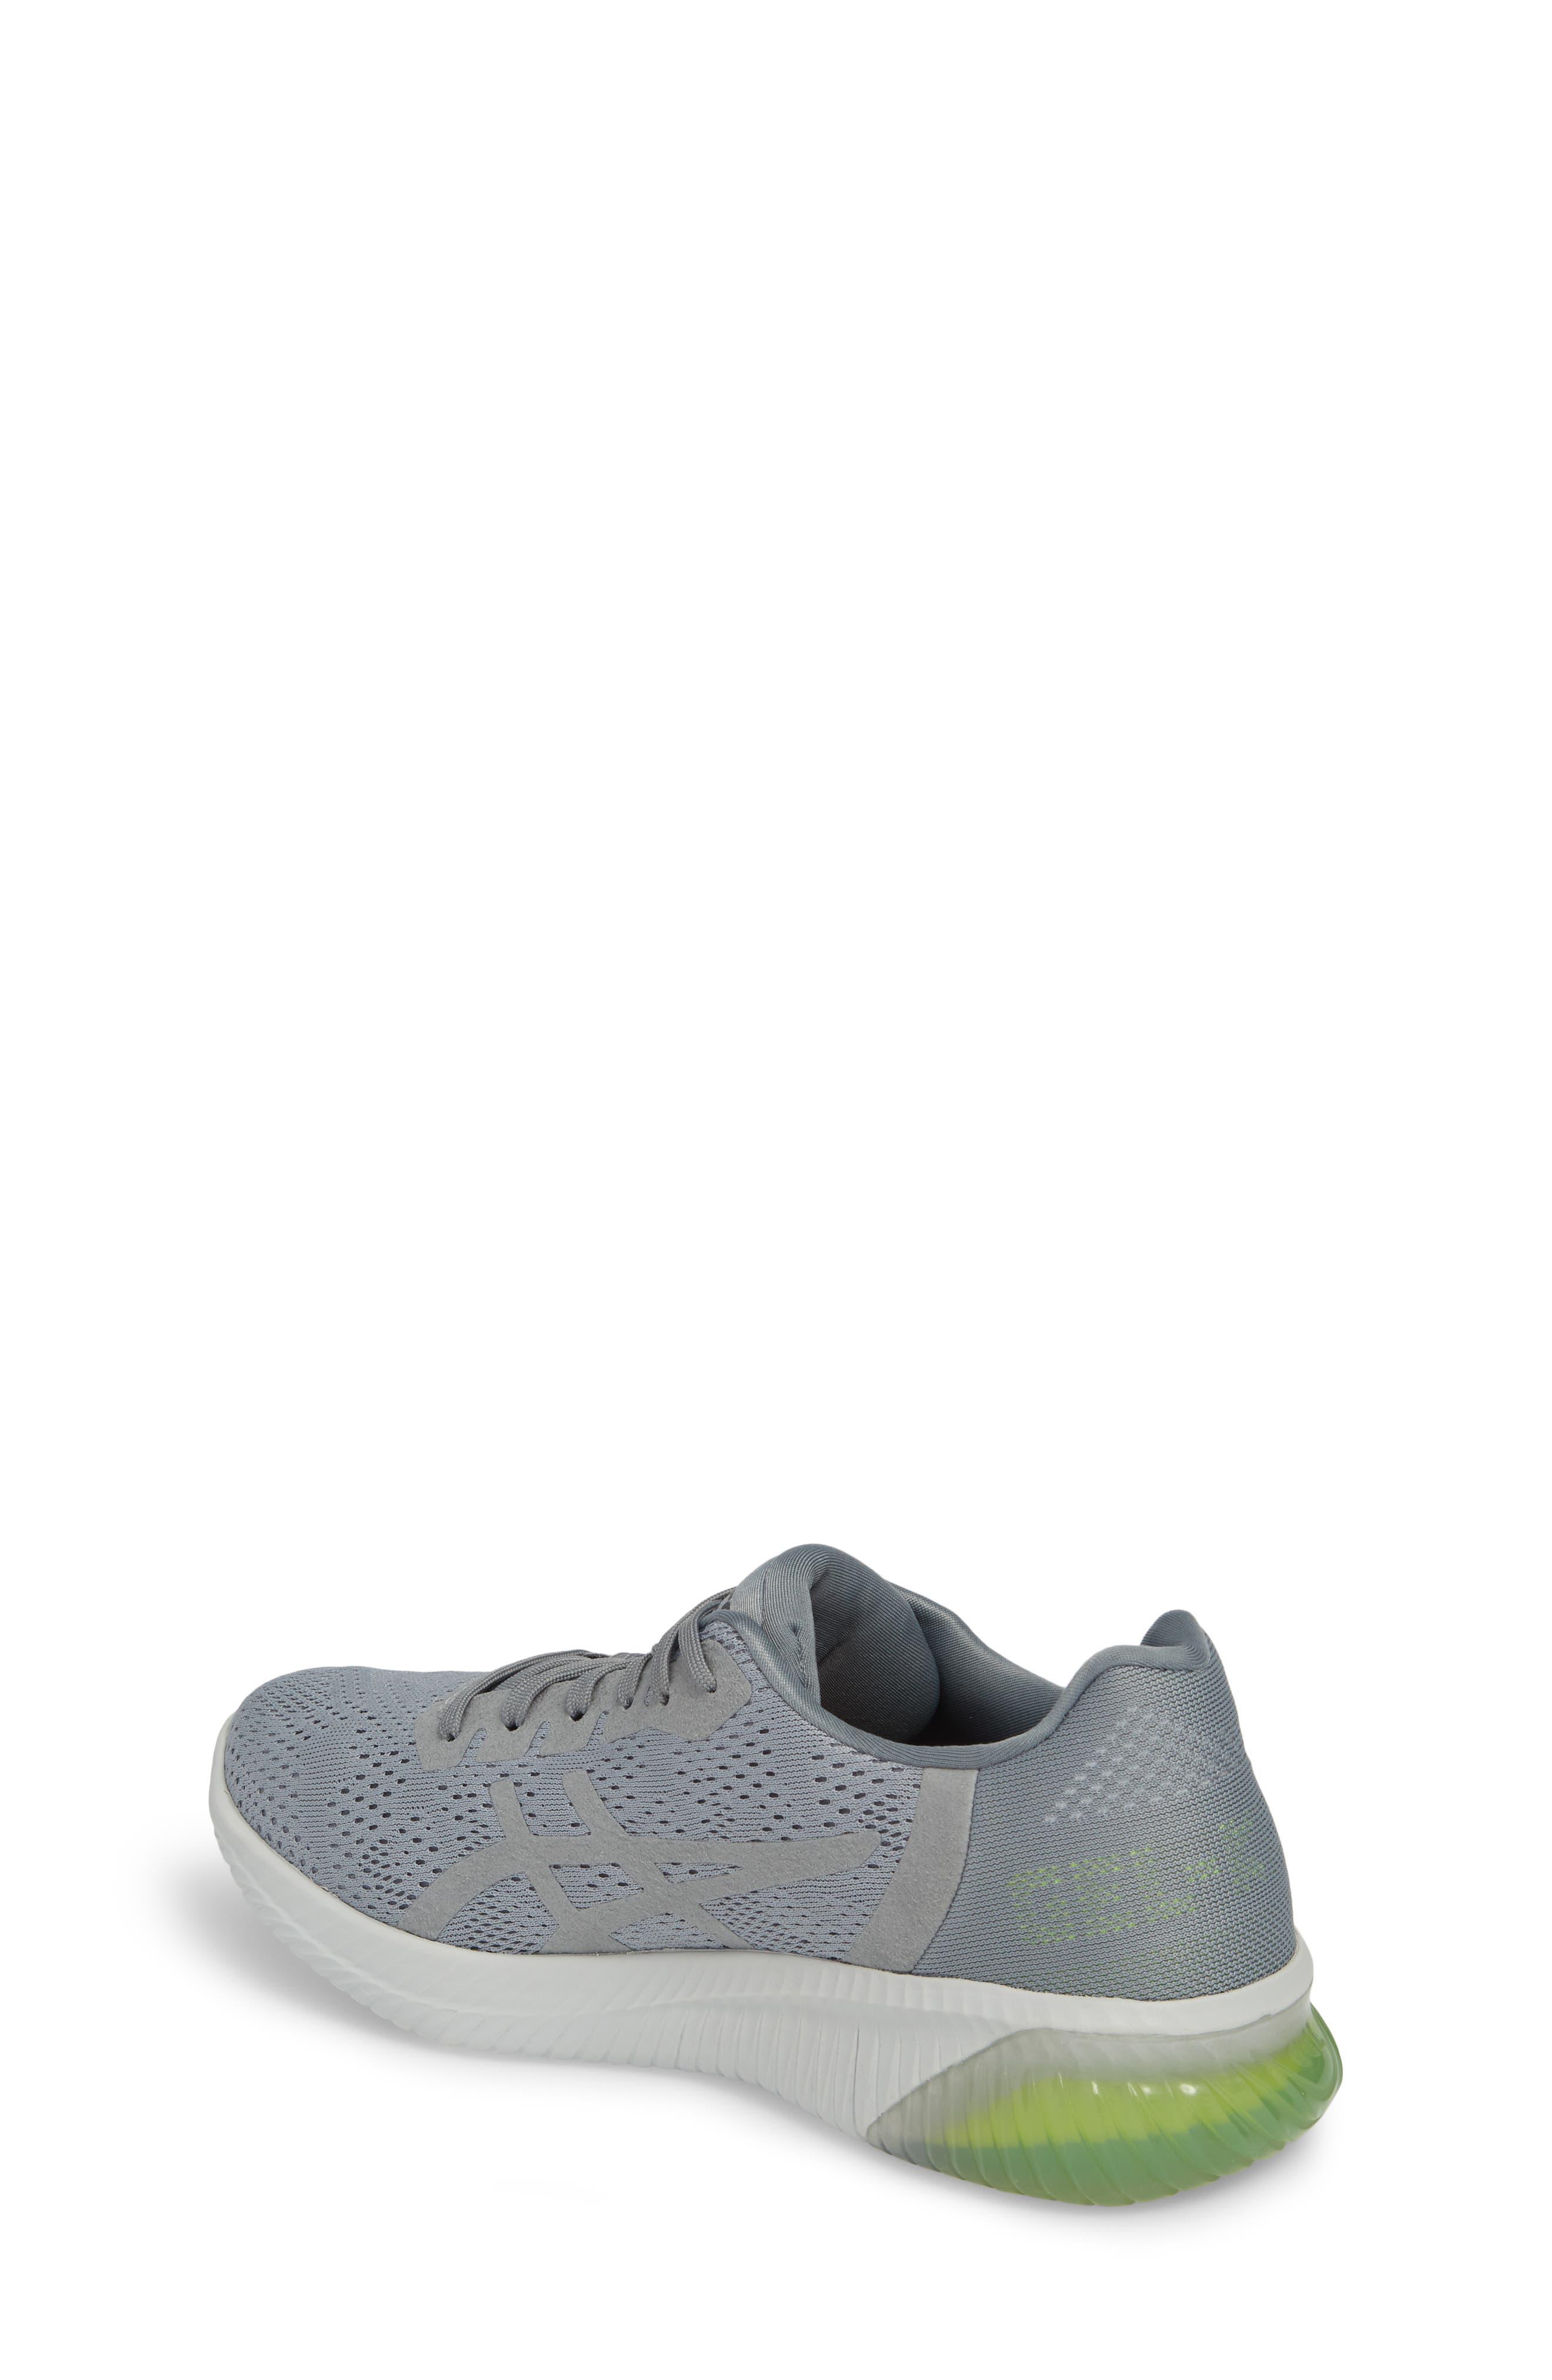 Gel-Kenun Running Shoe,                             Alternate thumbnail 2, color,                             023